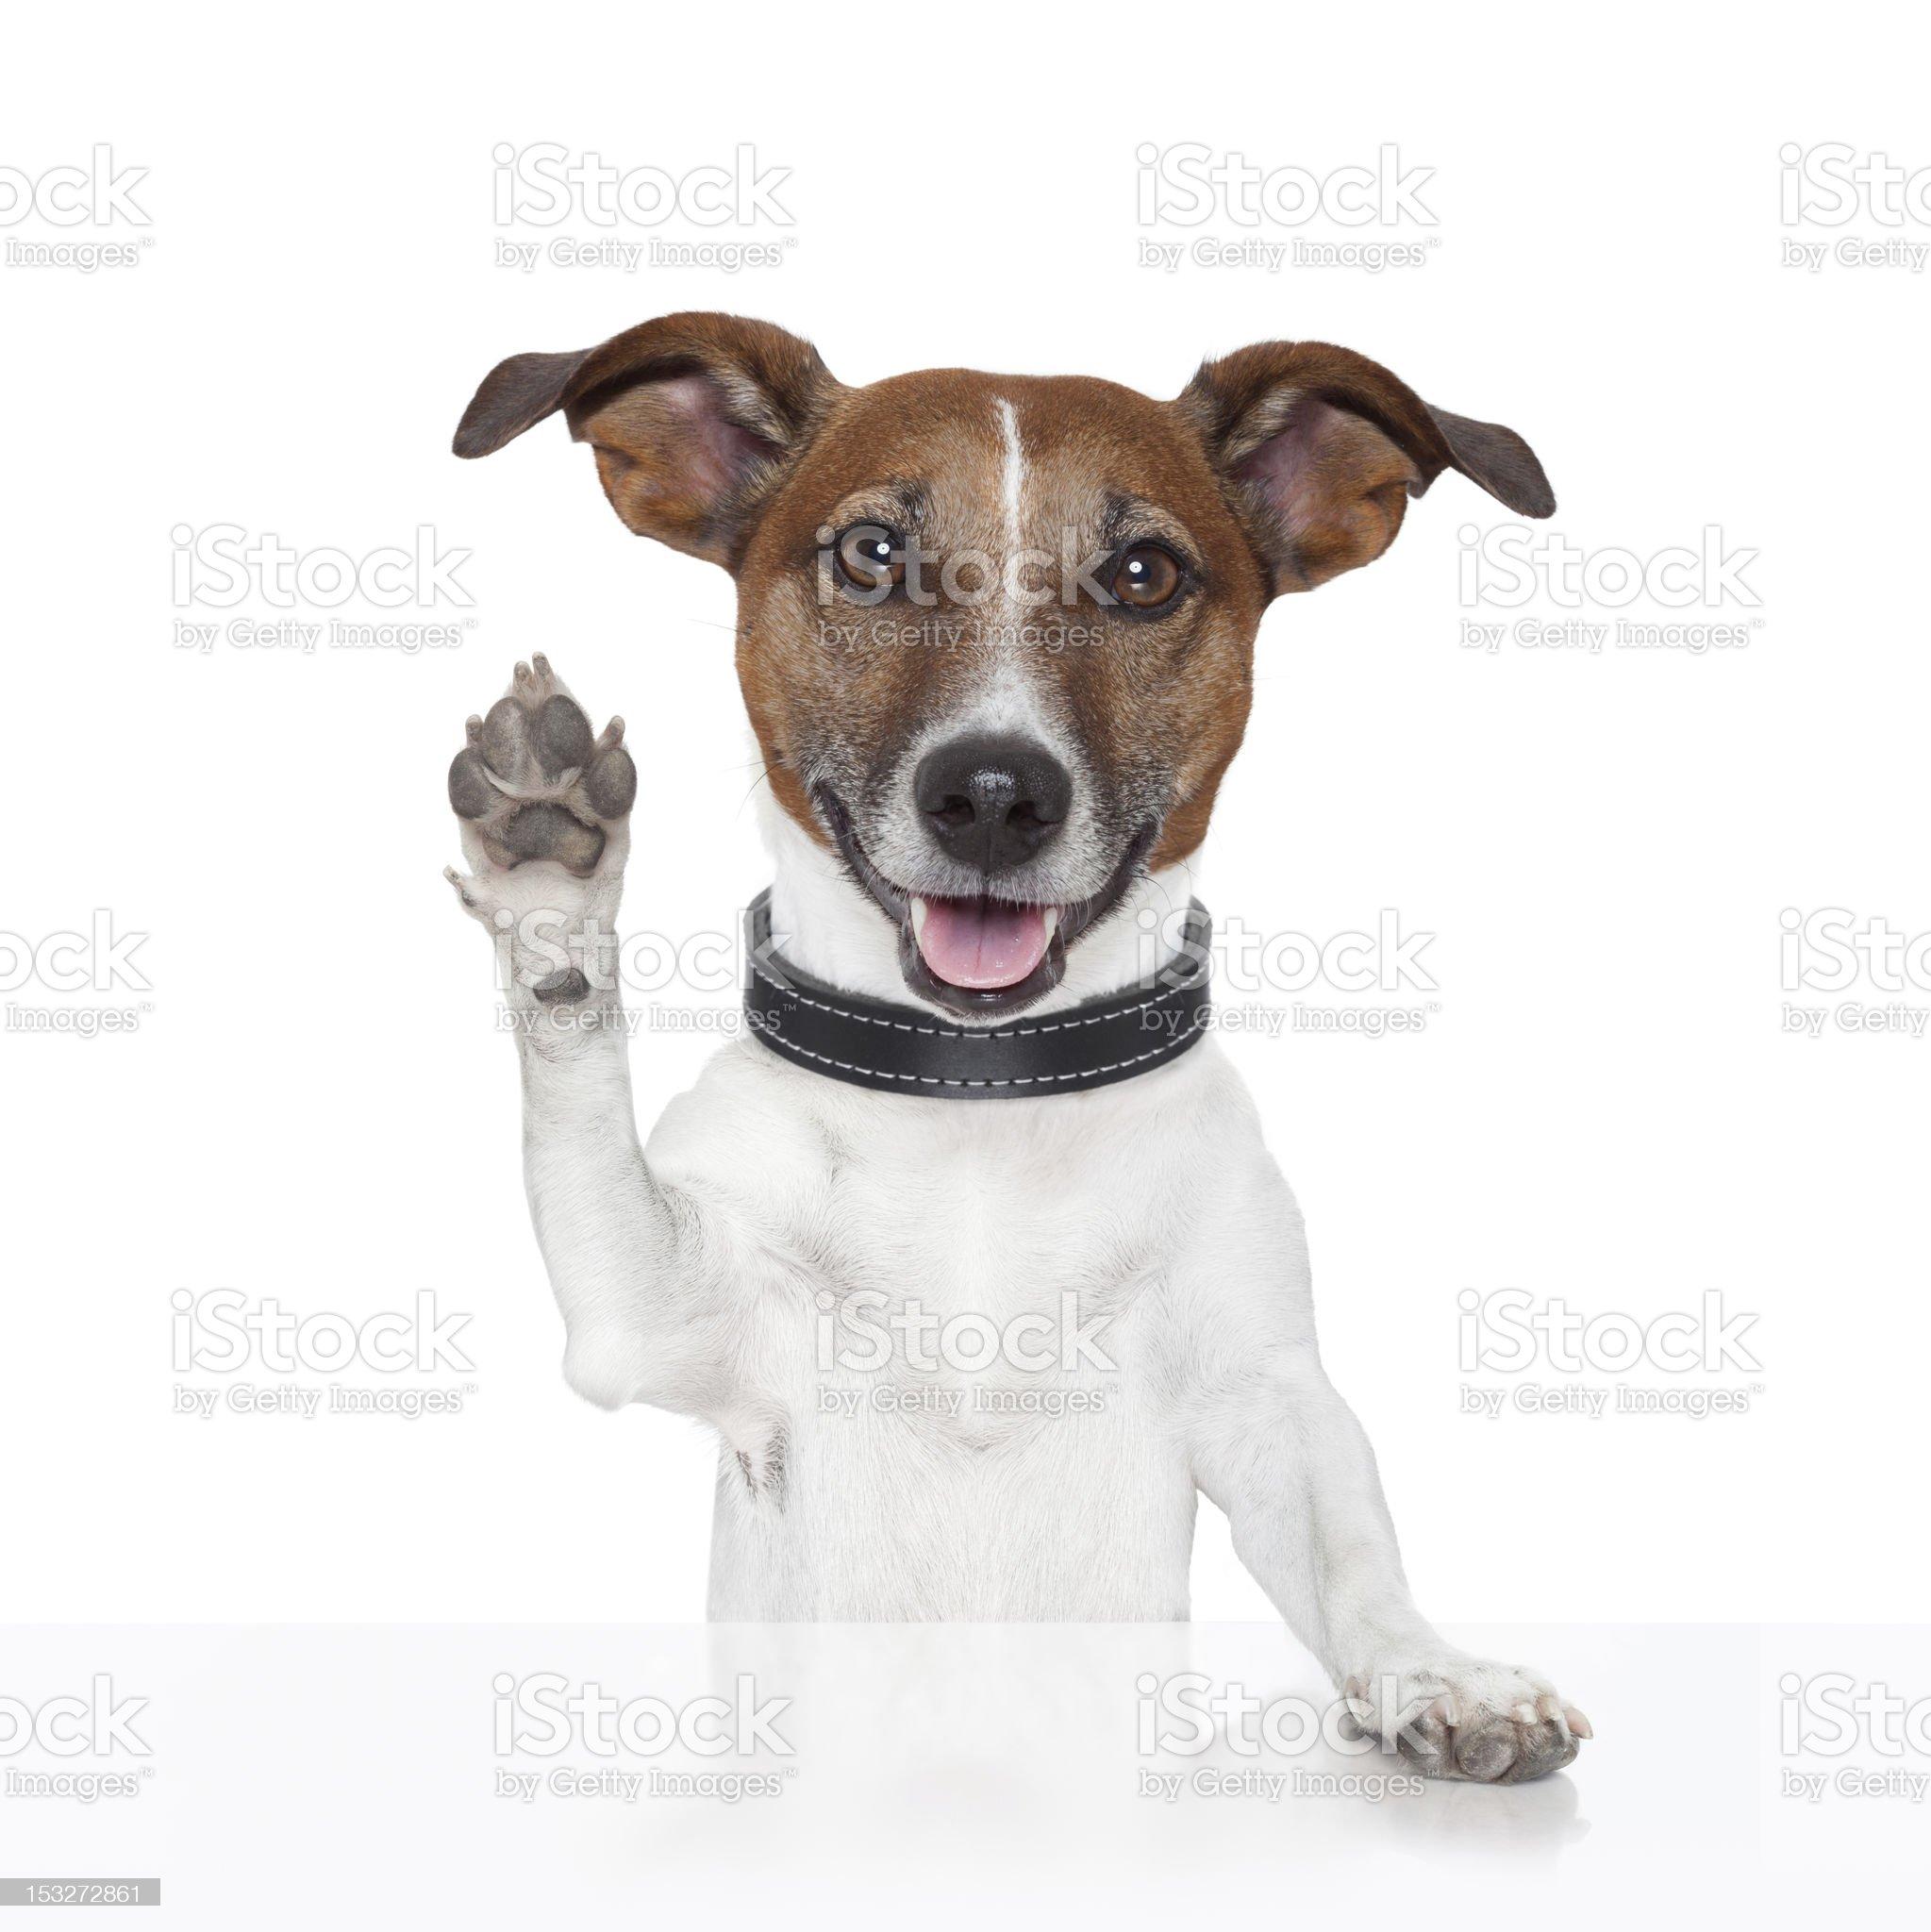 hello goodbye high five dog royalty-free stock photo